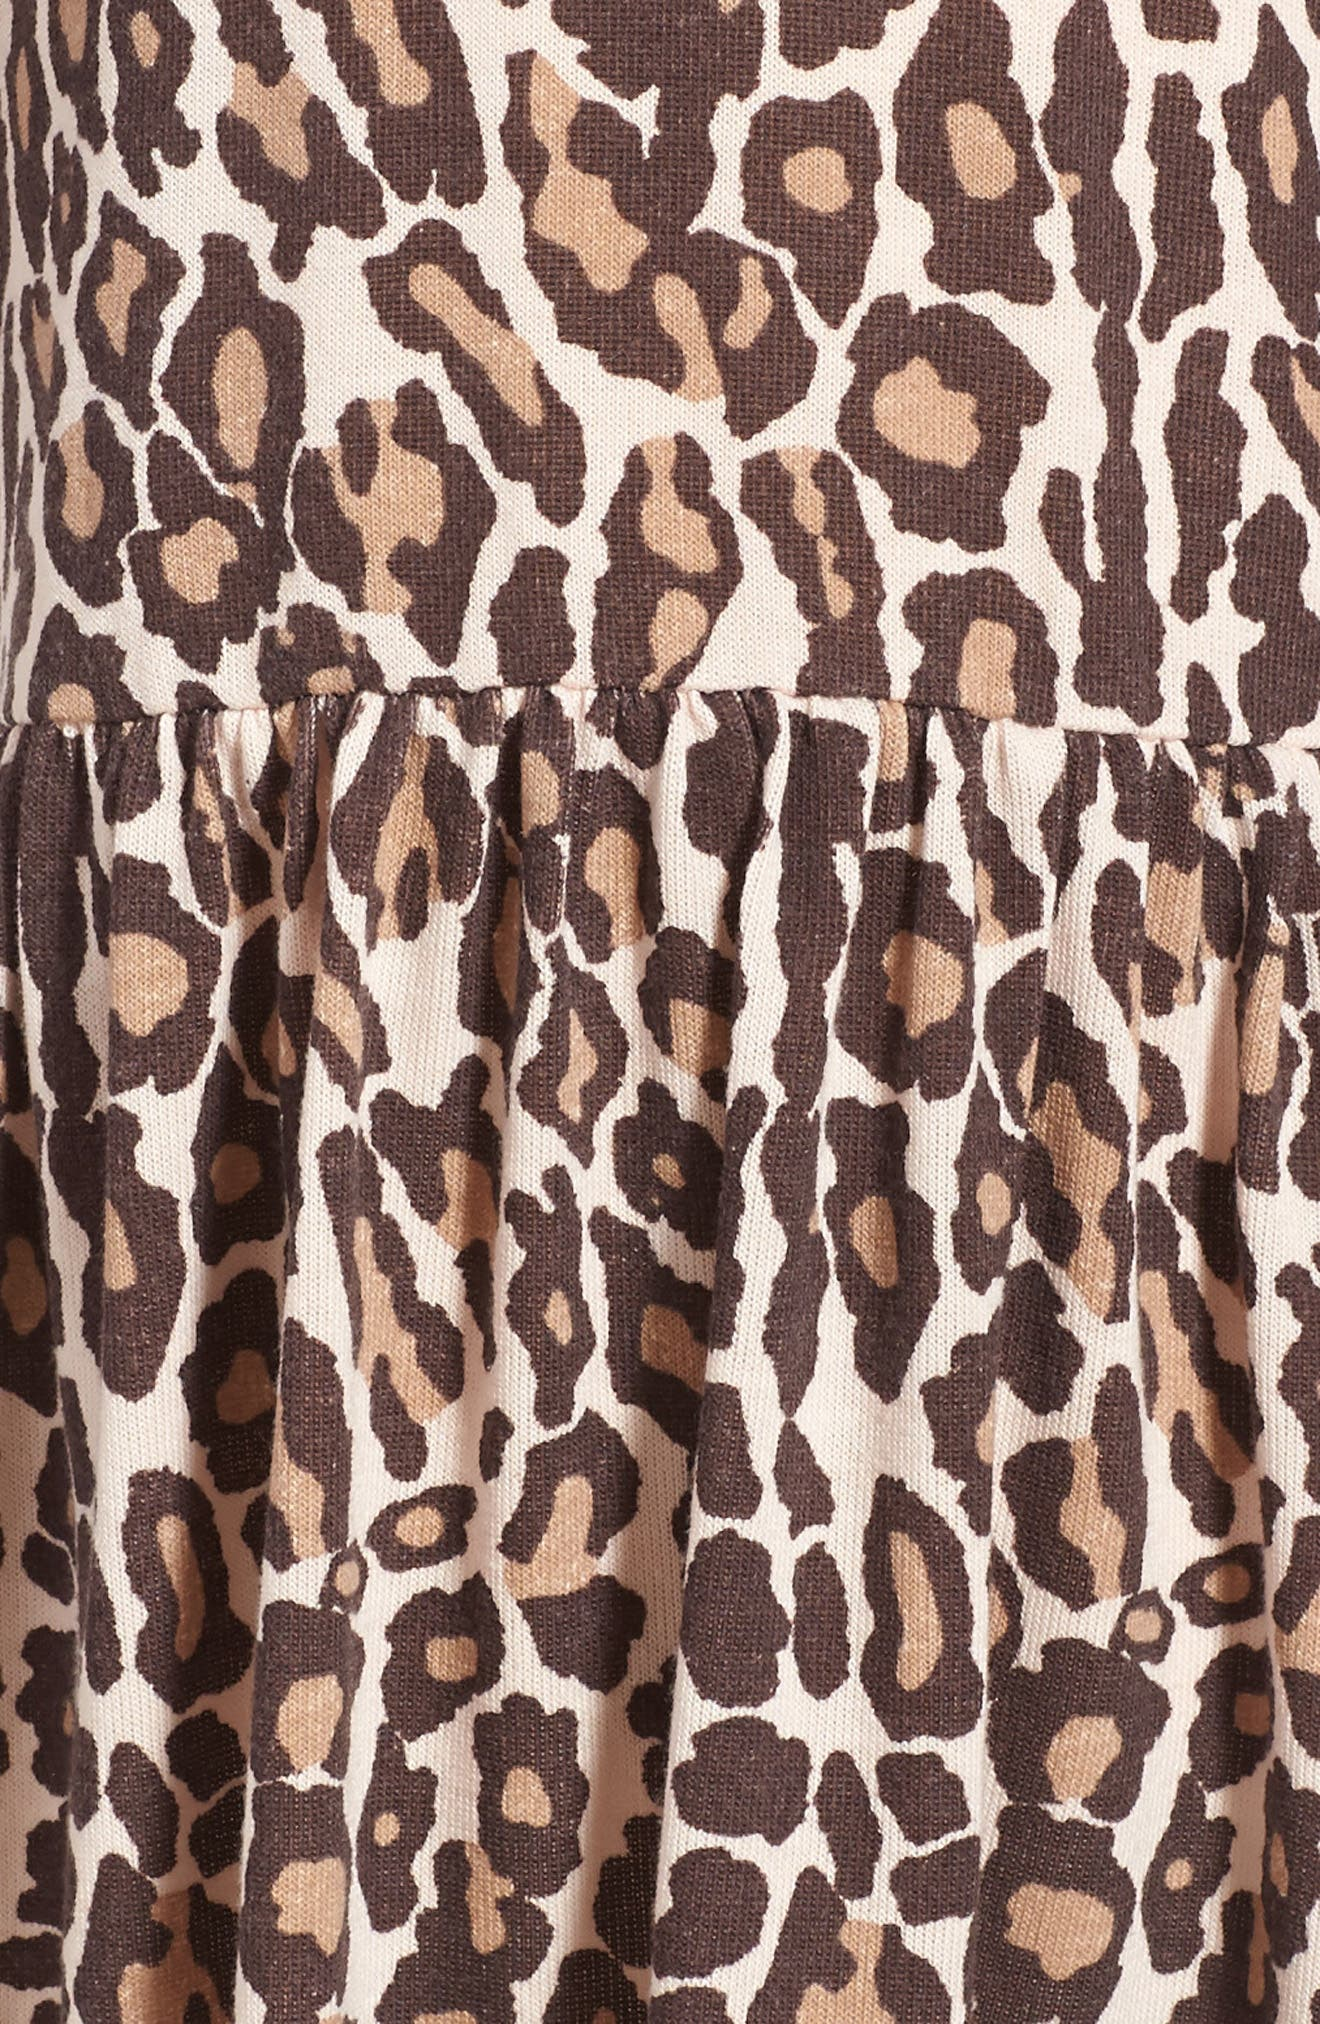 Animal Print Loose Knit Dress,                             Alternate thumbnail 3, color,                             255